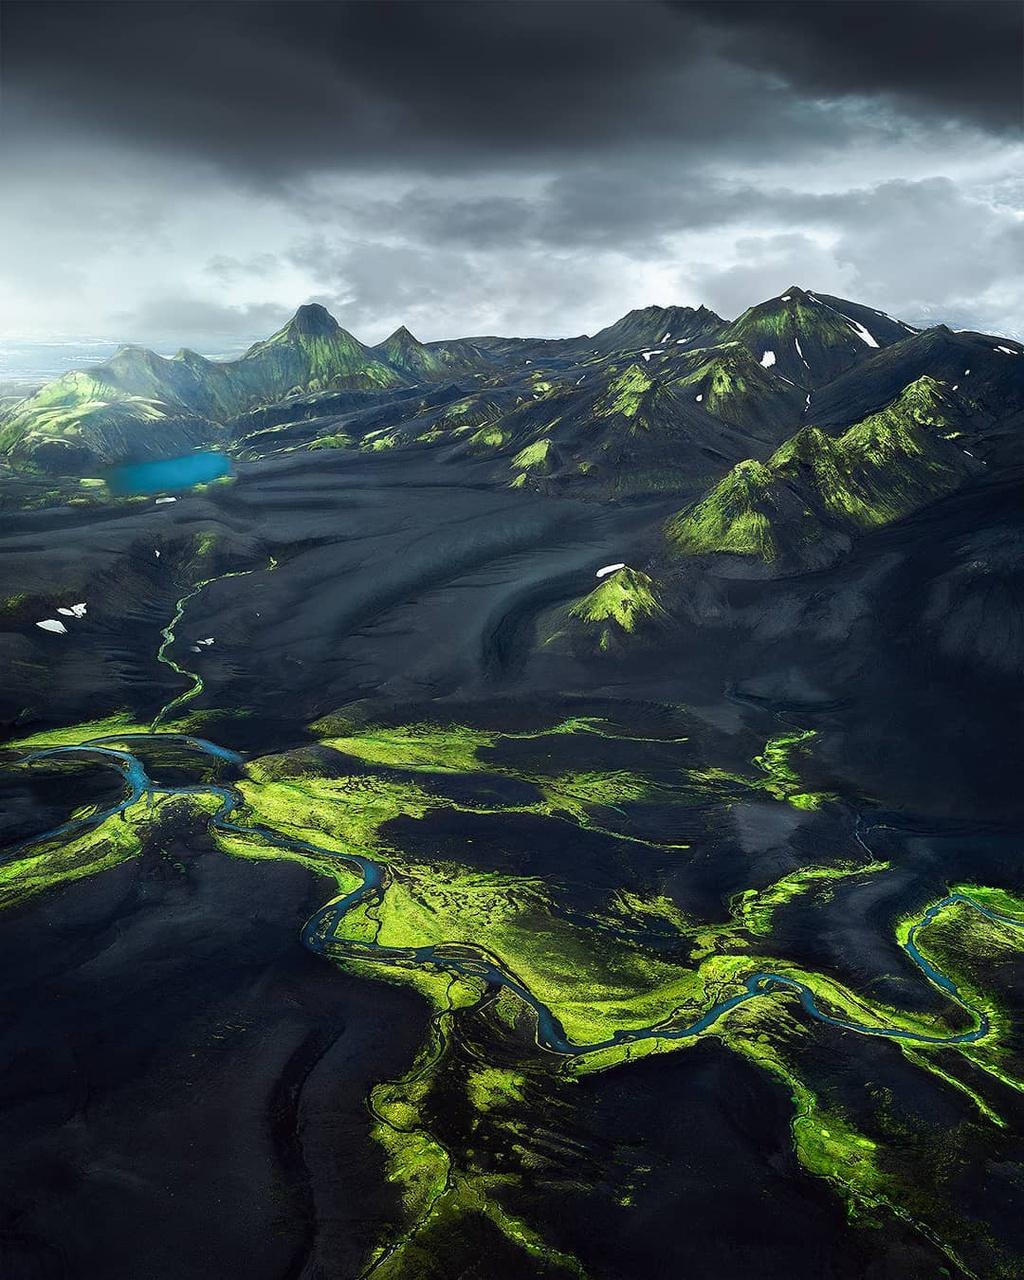 nhung-mien-dat-mau-xanh-o-Iceland-ivivu-7